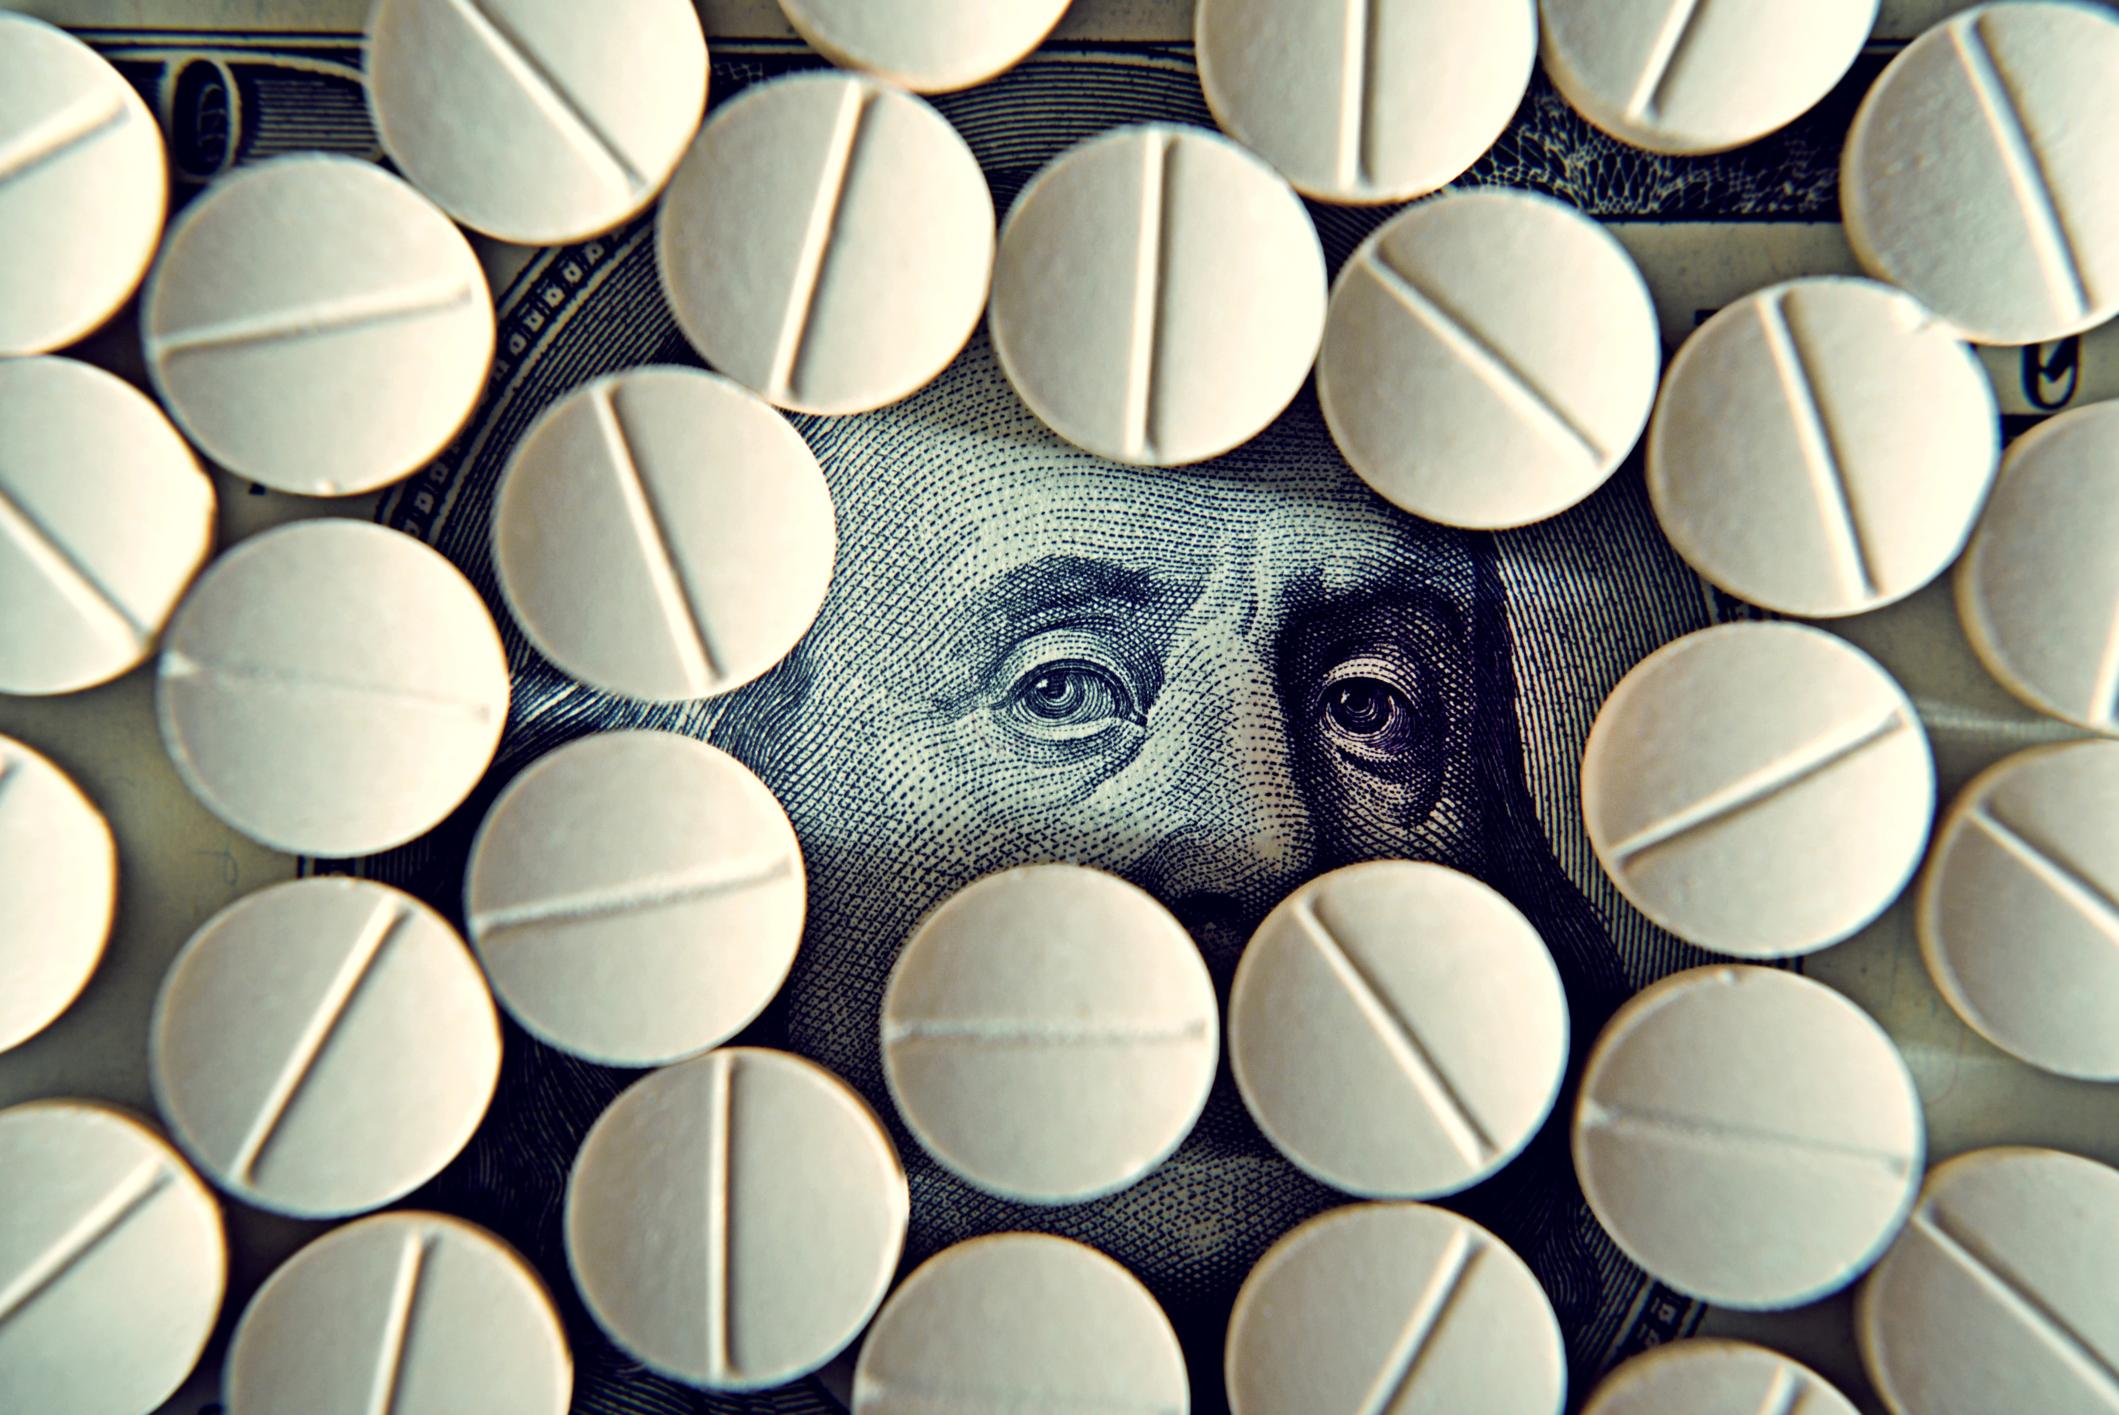 Prescription drug tablets covering a hundred dollar bill, with Ben Franklin's eyes still visible.